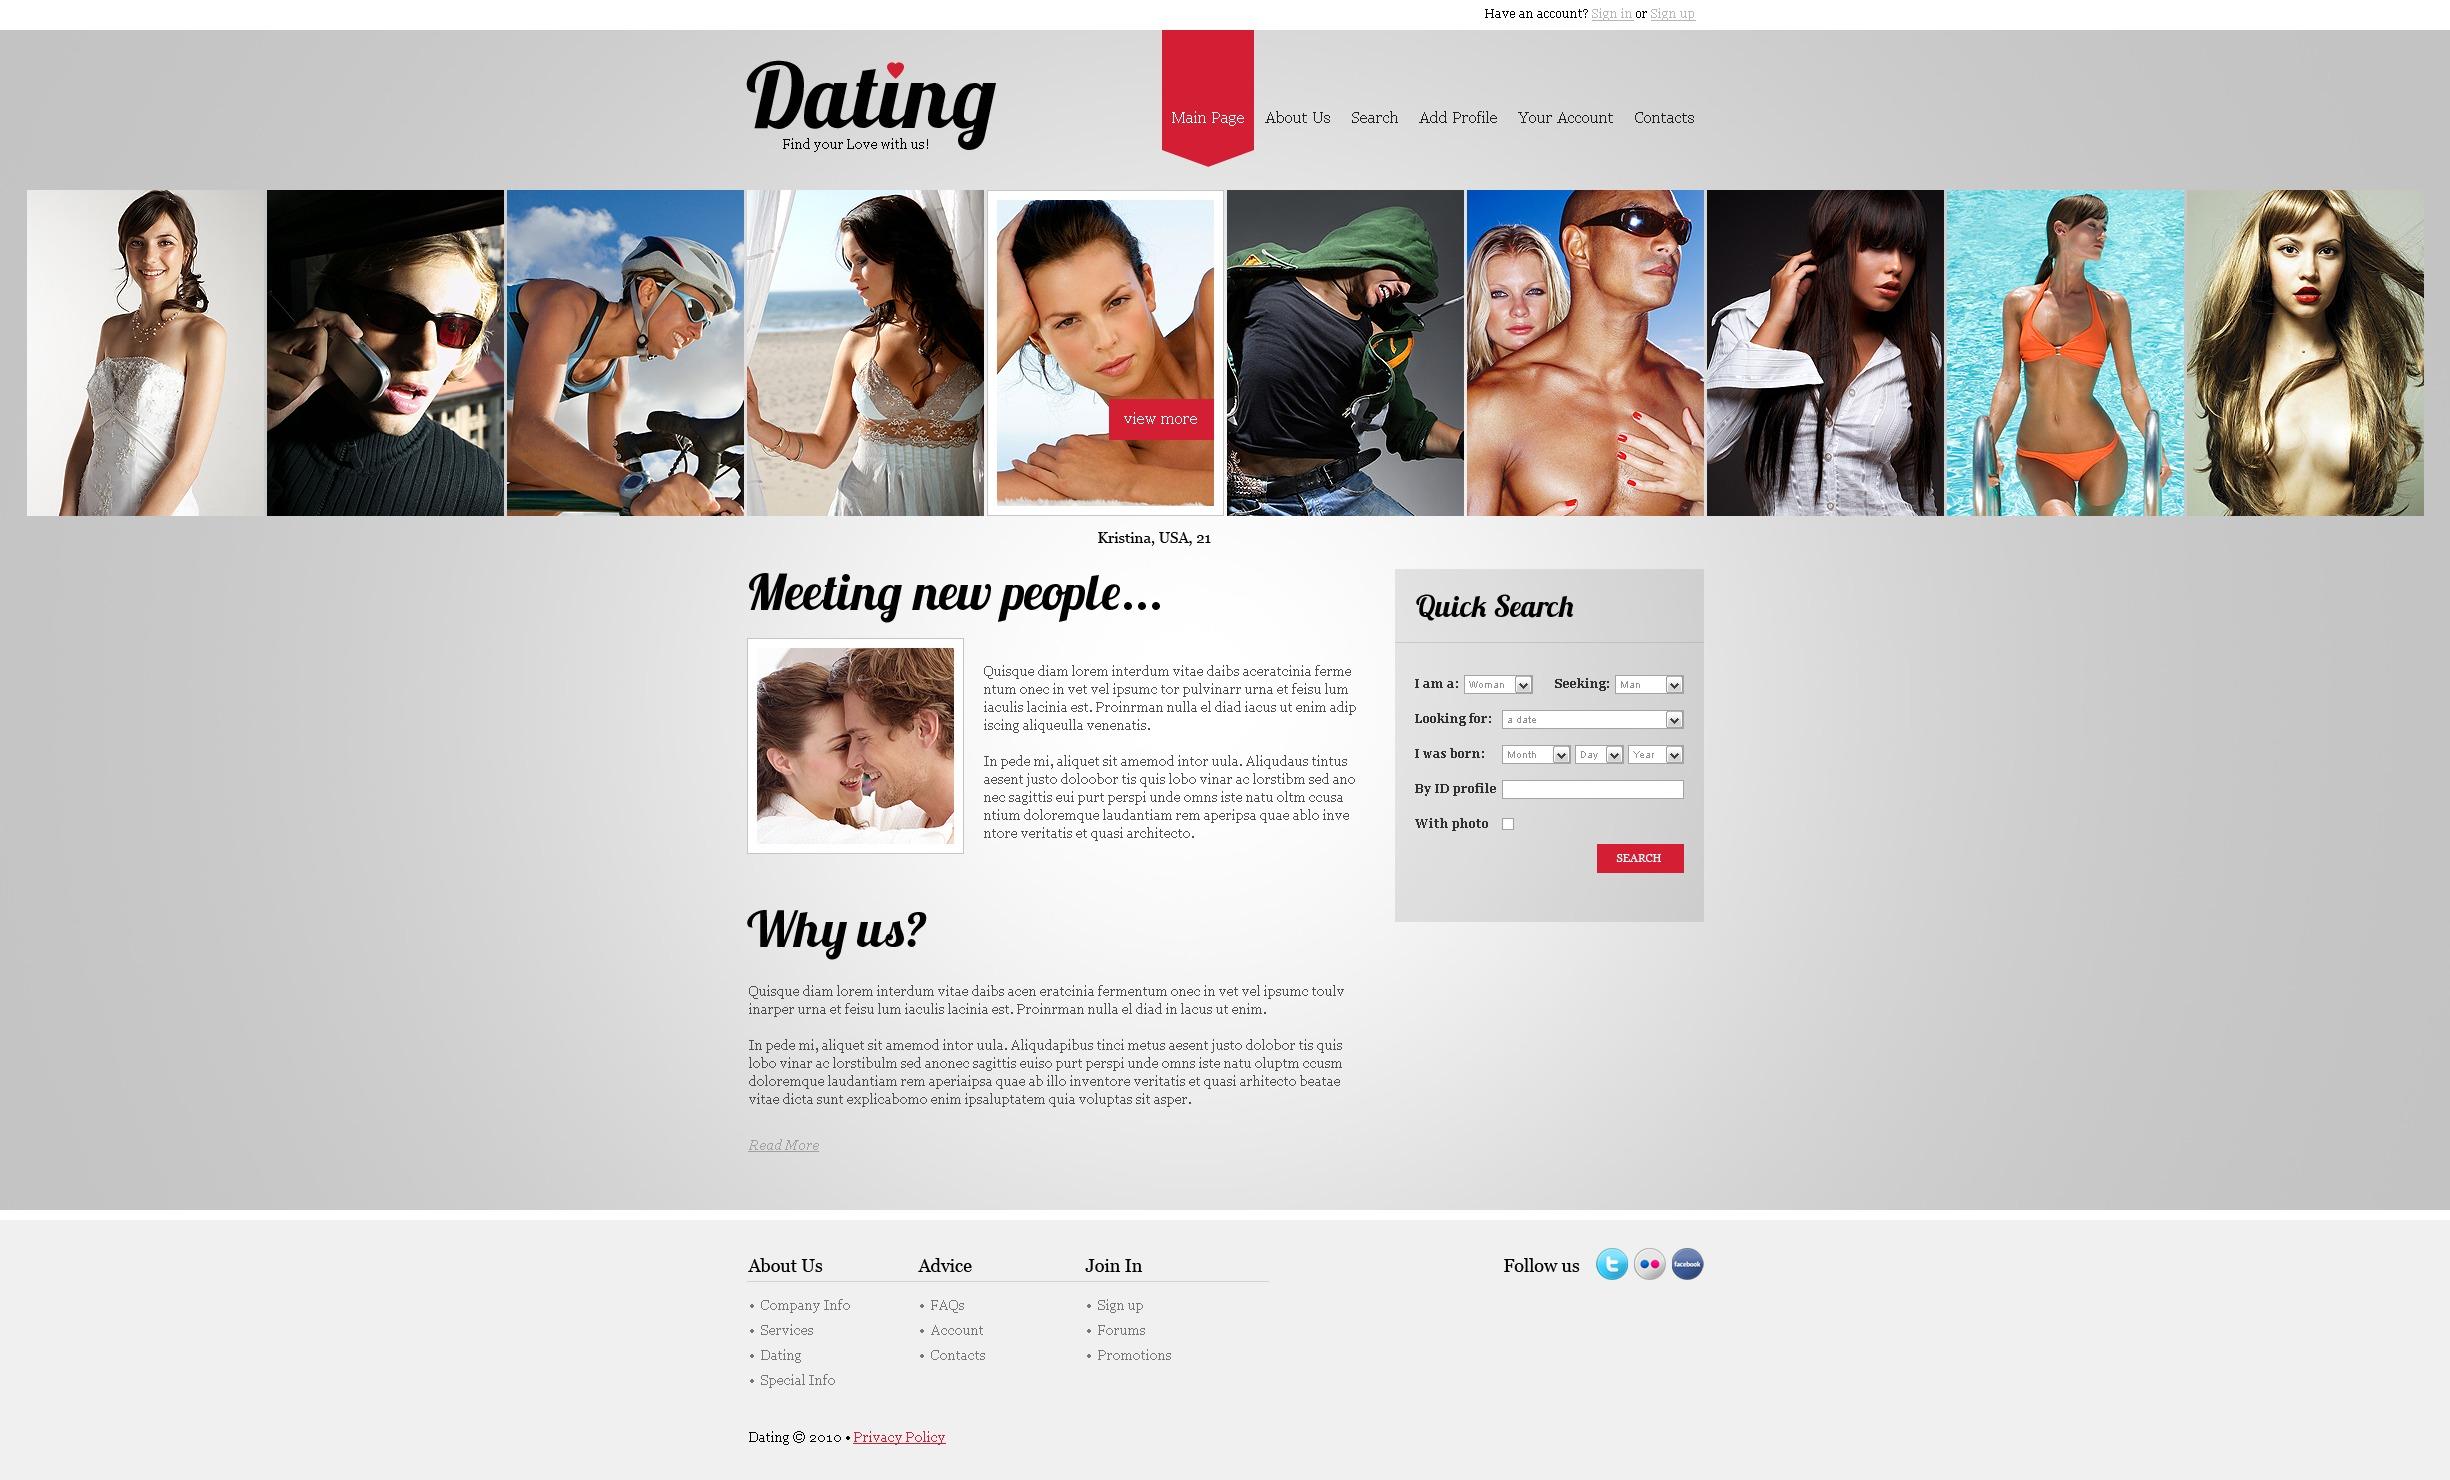 PHP CSS HTML Drupal AJAX Stripe JSON LESS/Sass/SCSS Shopify-mallit Word Dating Experts valmiina palkattavaksi työhösi sivustolla Freelancer.